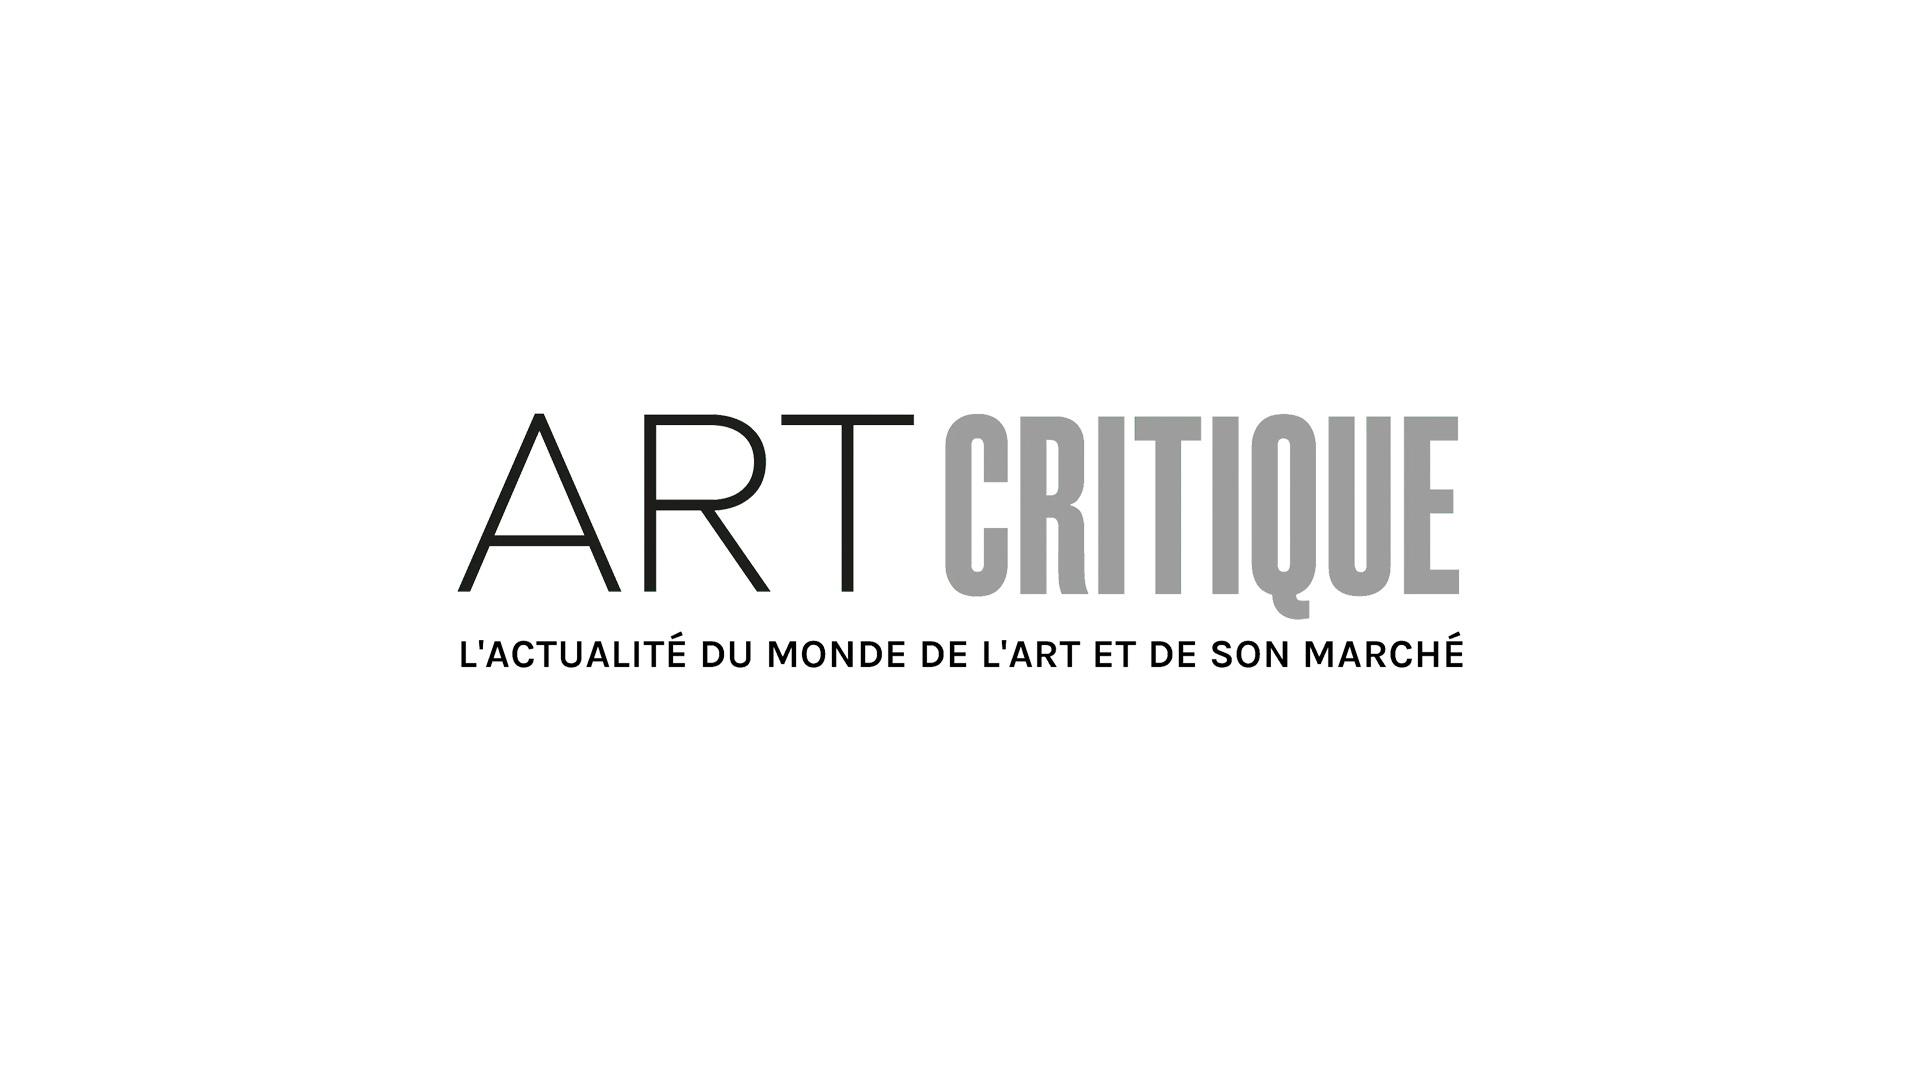 Wynn Resorts to build massive complex highlights the arts